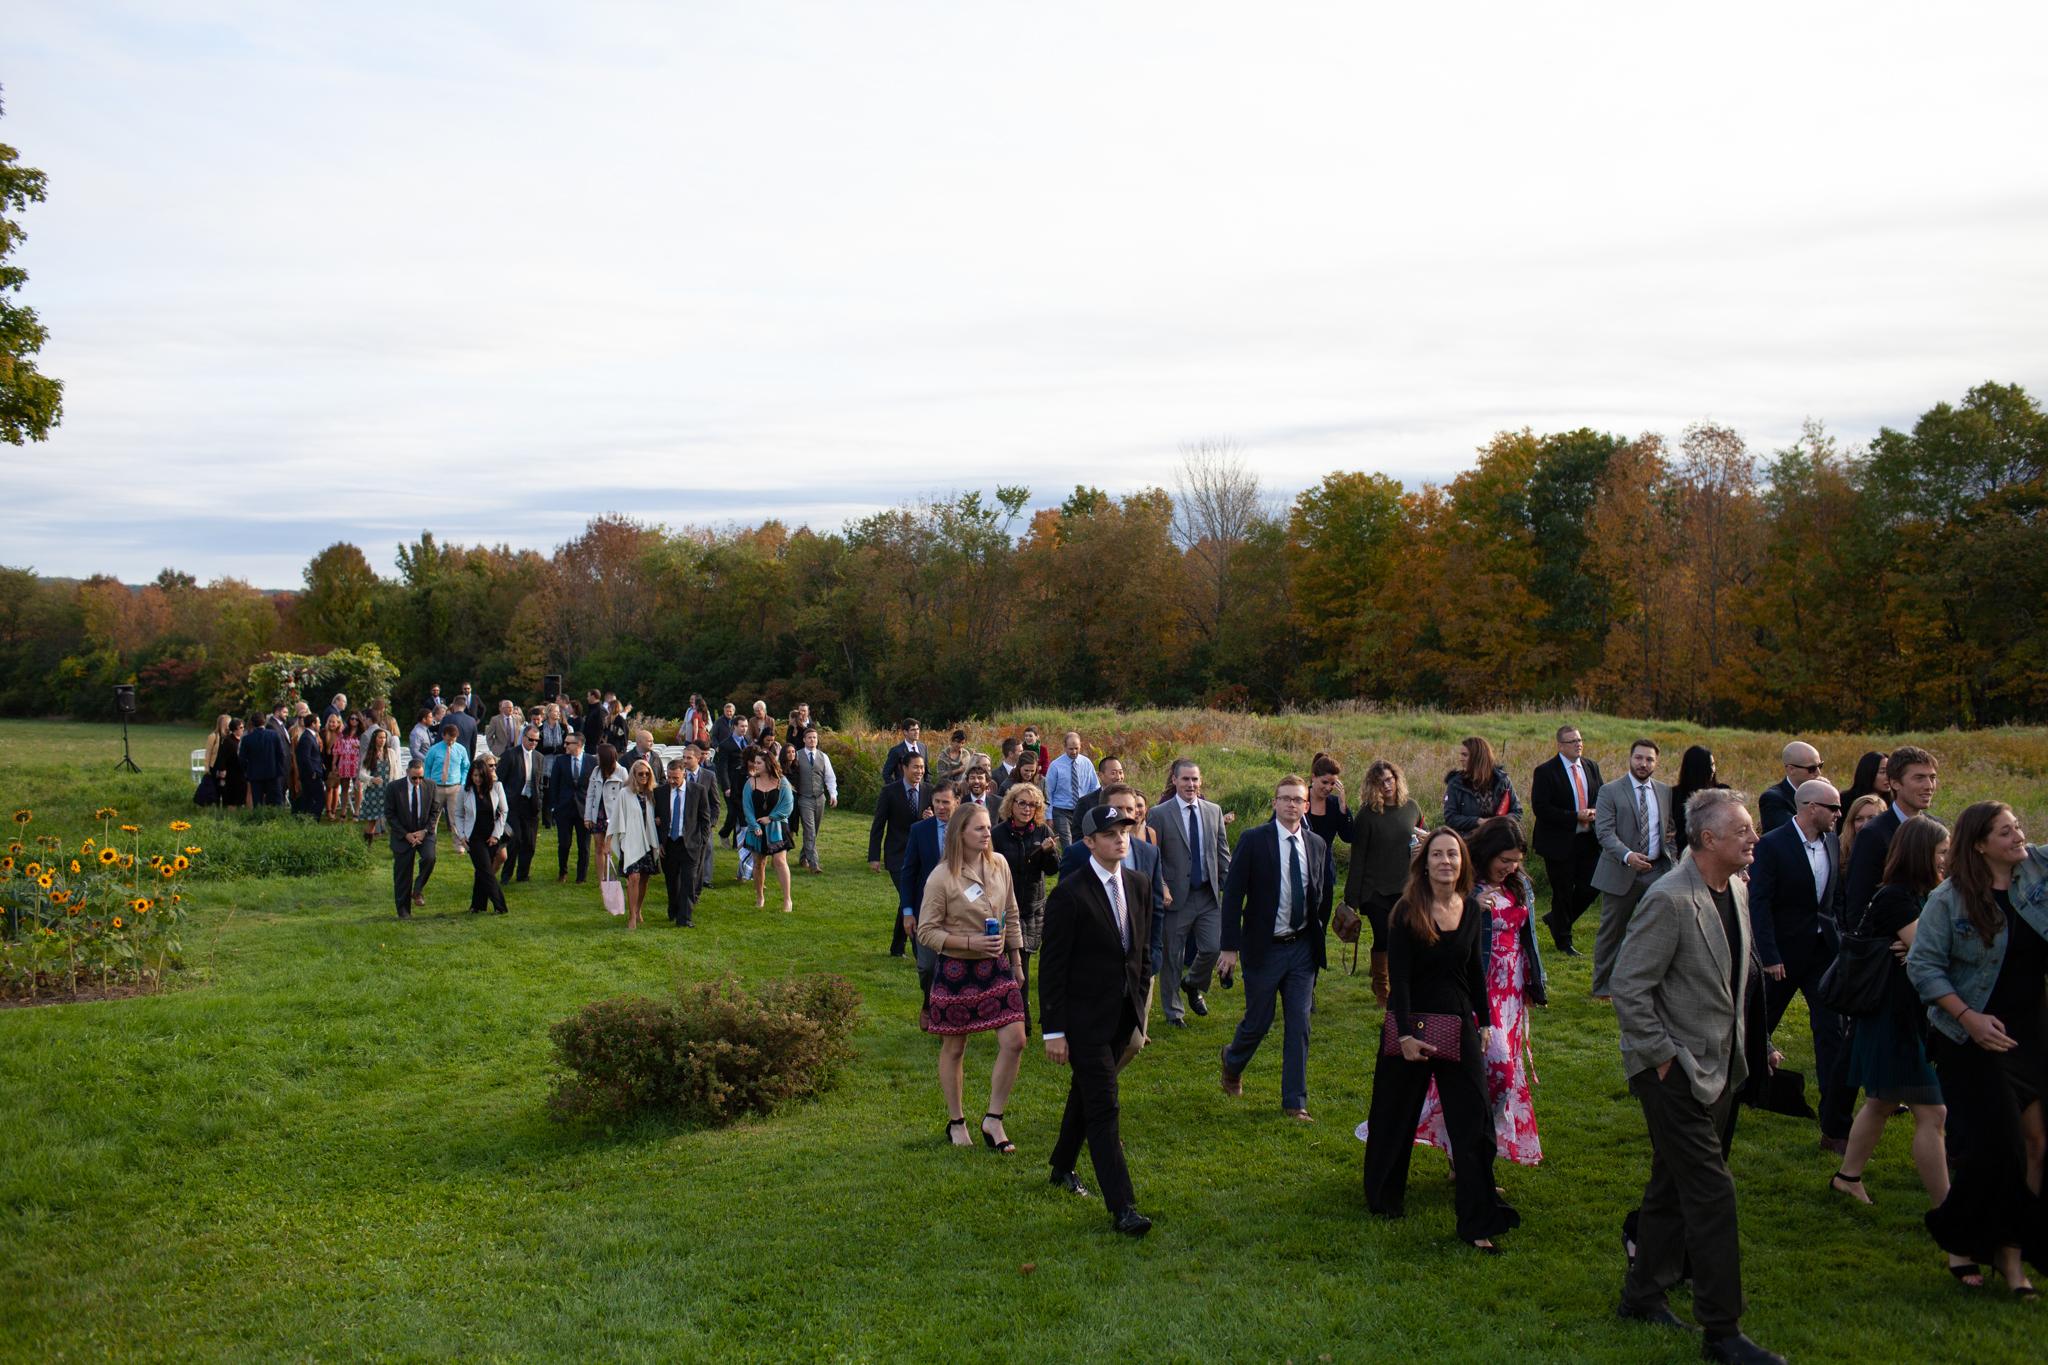 maine-farm-wedding-photographer-stepheneycollins-155.jpg